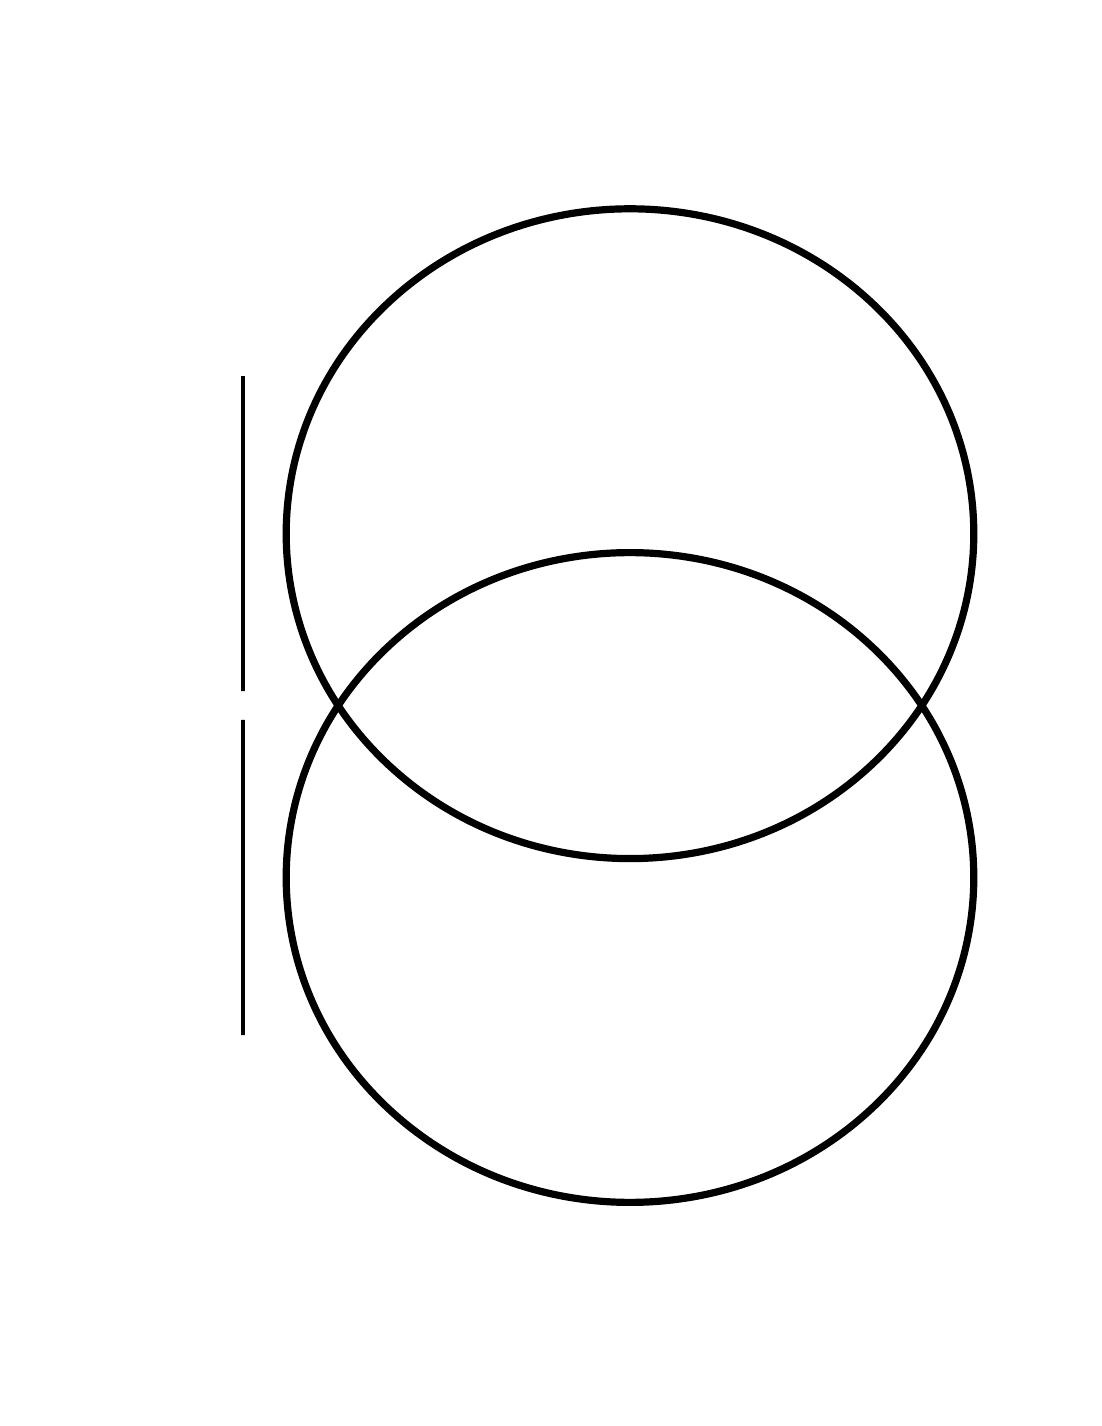 Venn Diagram Template Printable